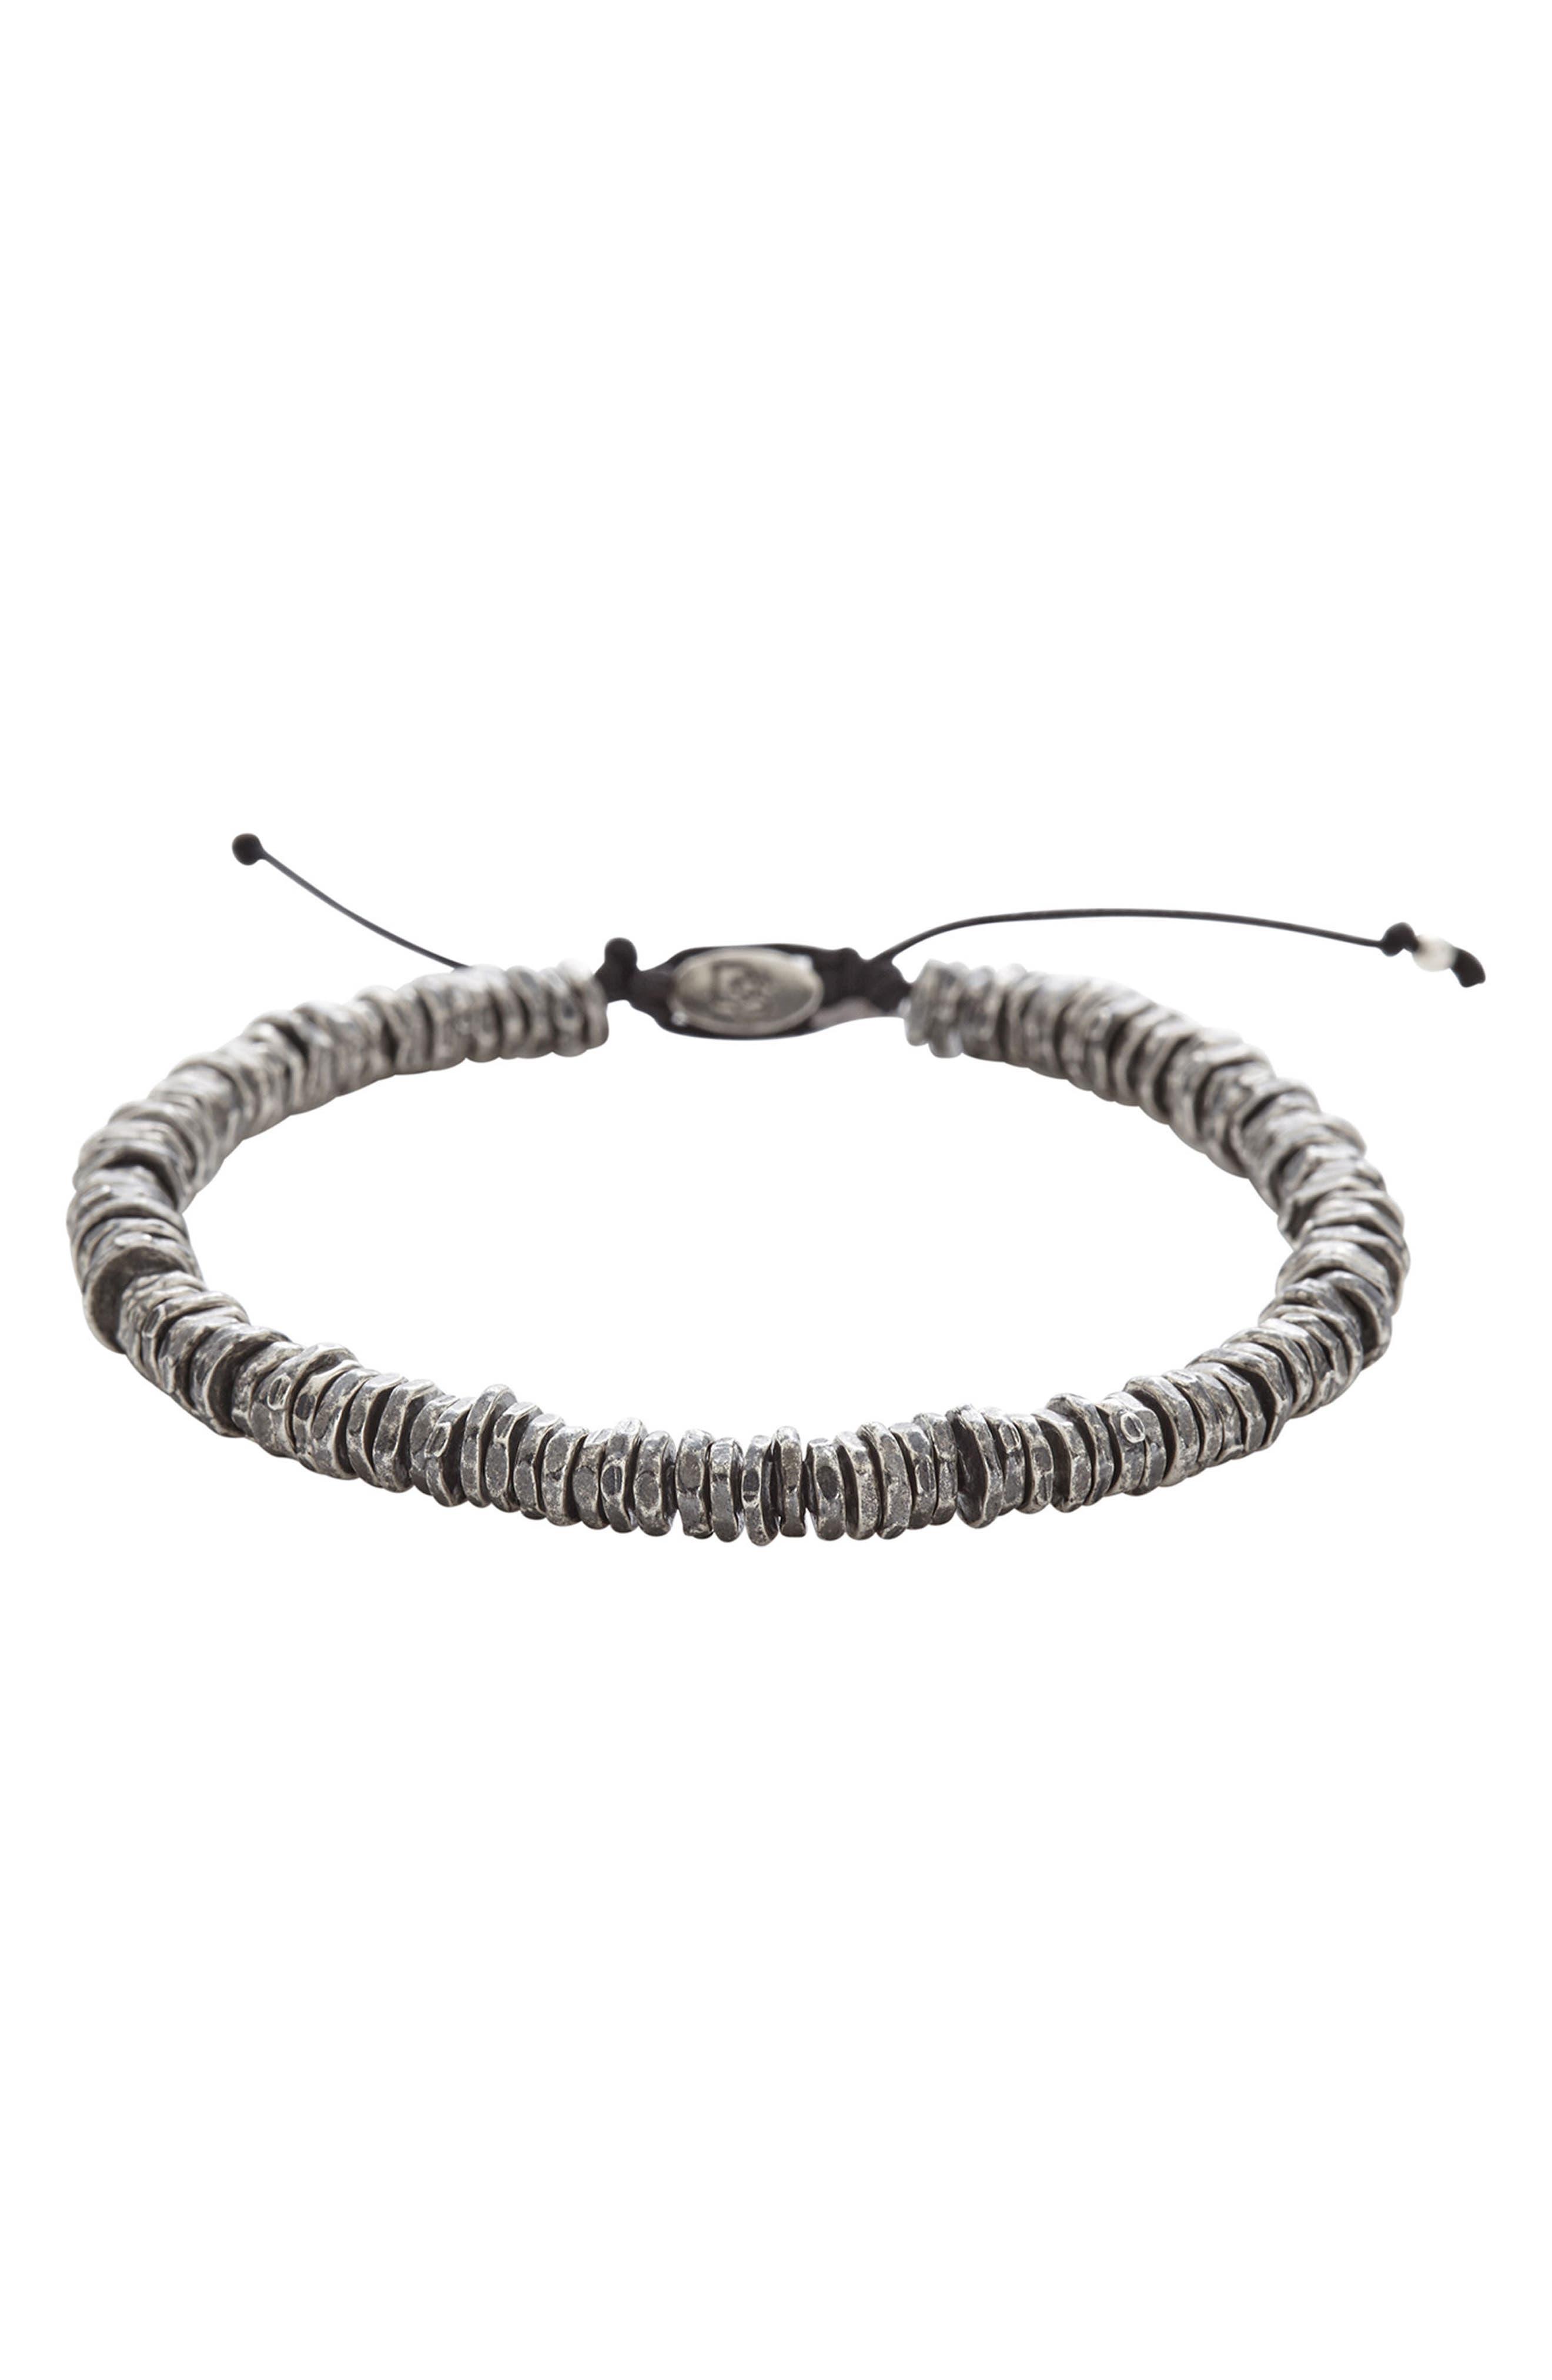 Main Image - Degs & Sal Washer Bead Bracelet